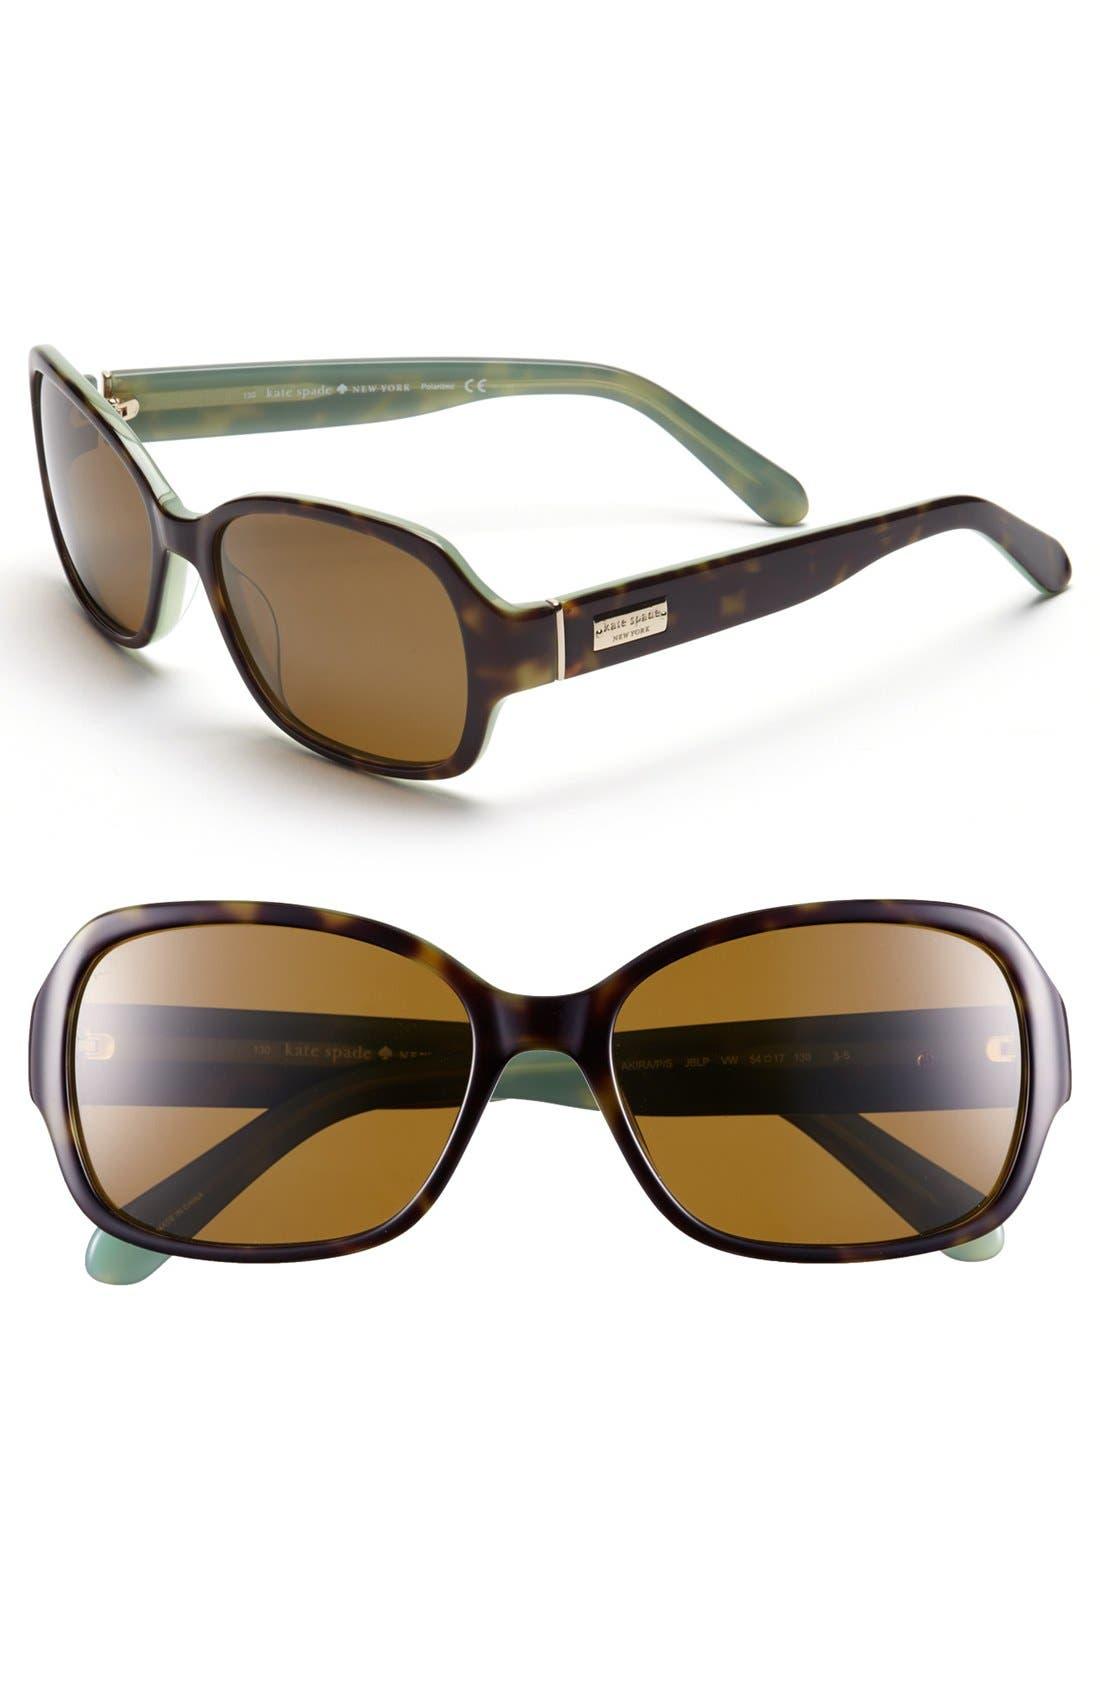 Main Image - kate spade new york 'akira' 54mm polarized sunglasses